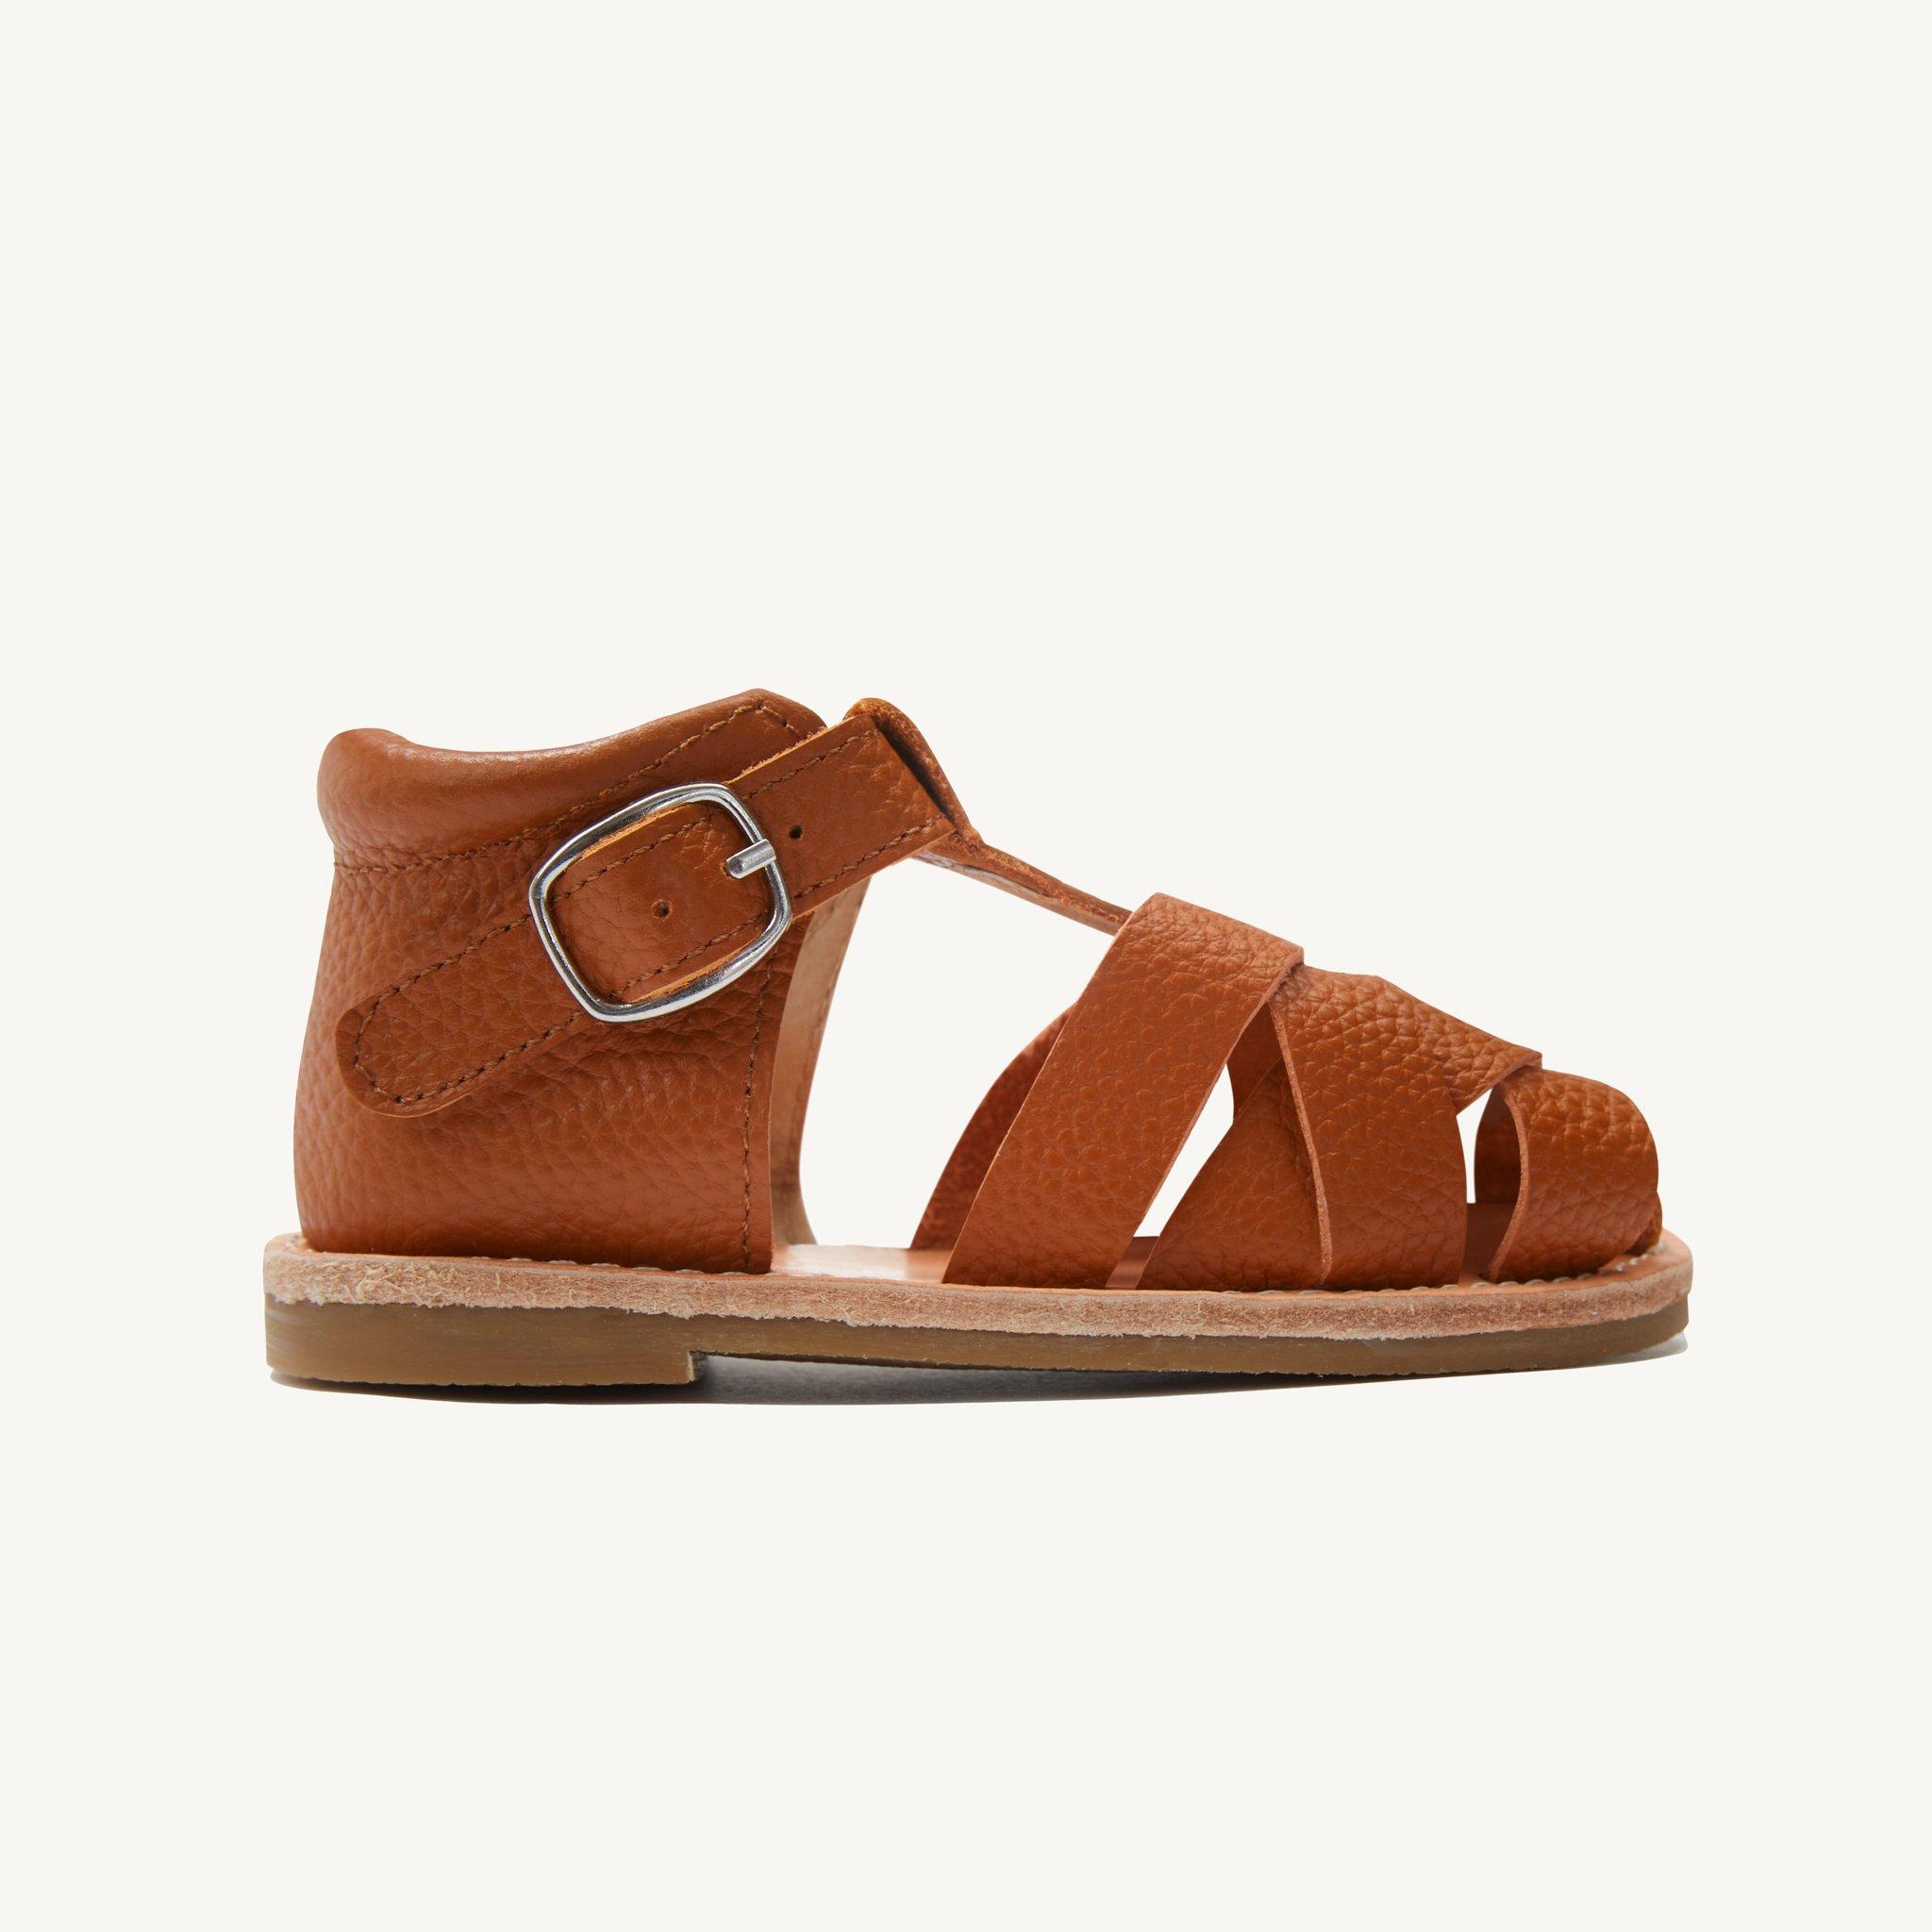 rylee cognac leather toddler sandals